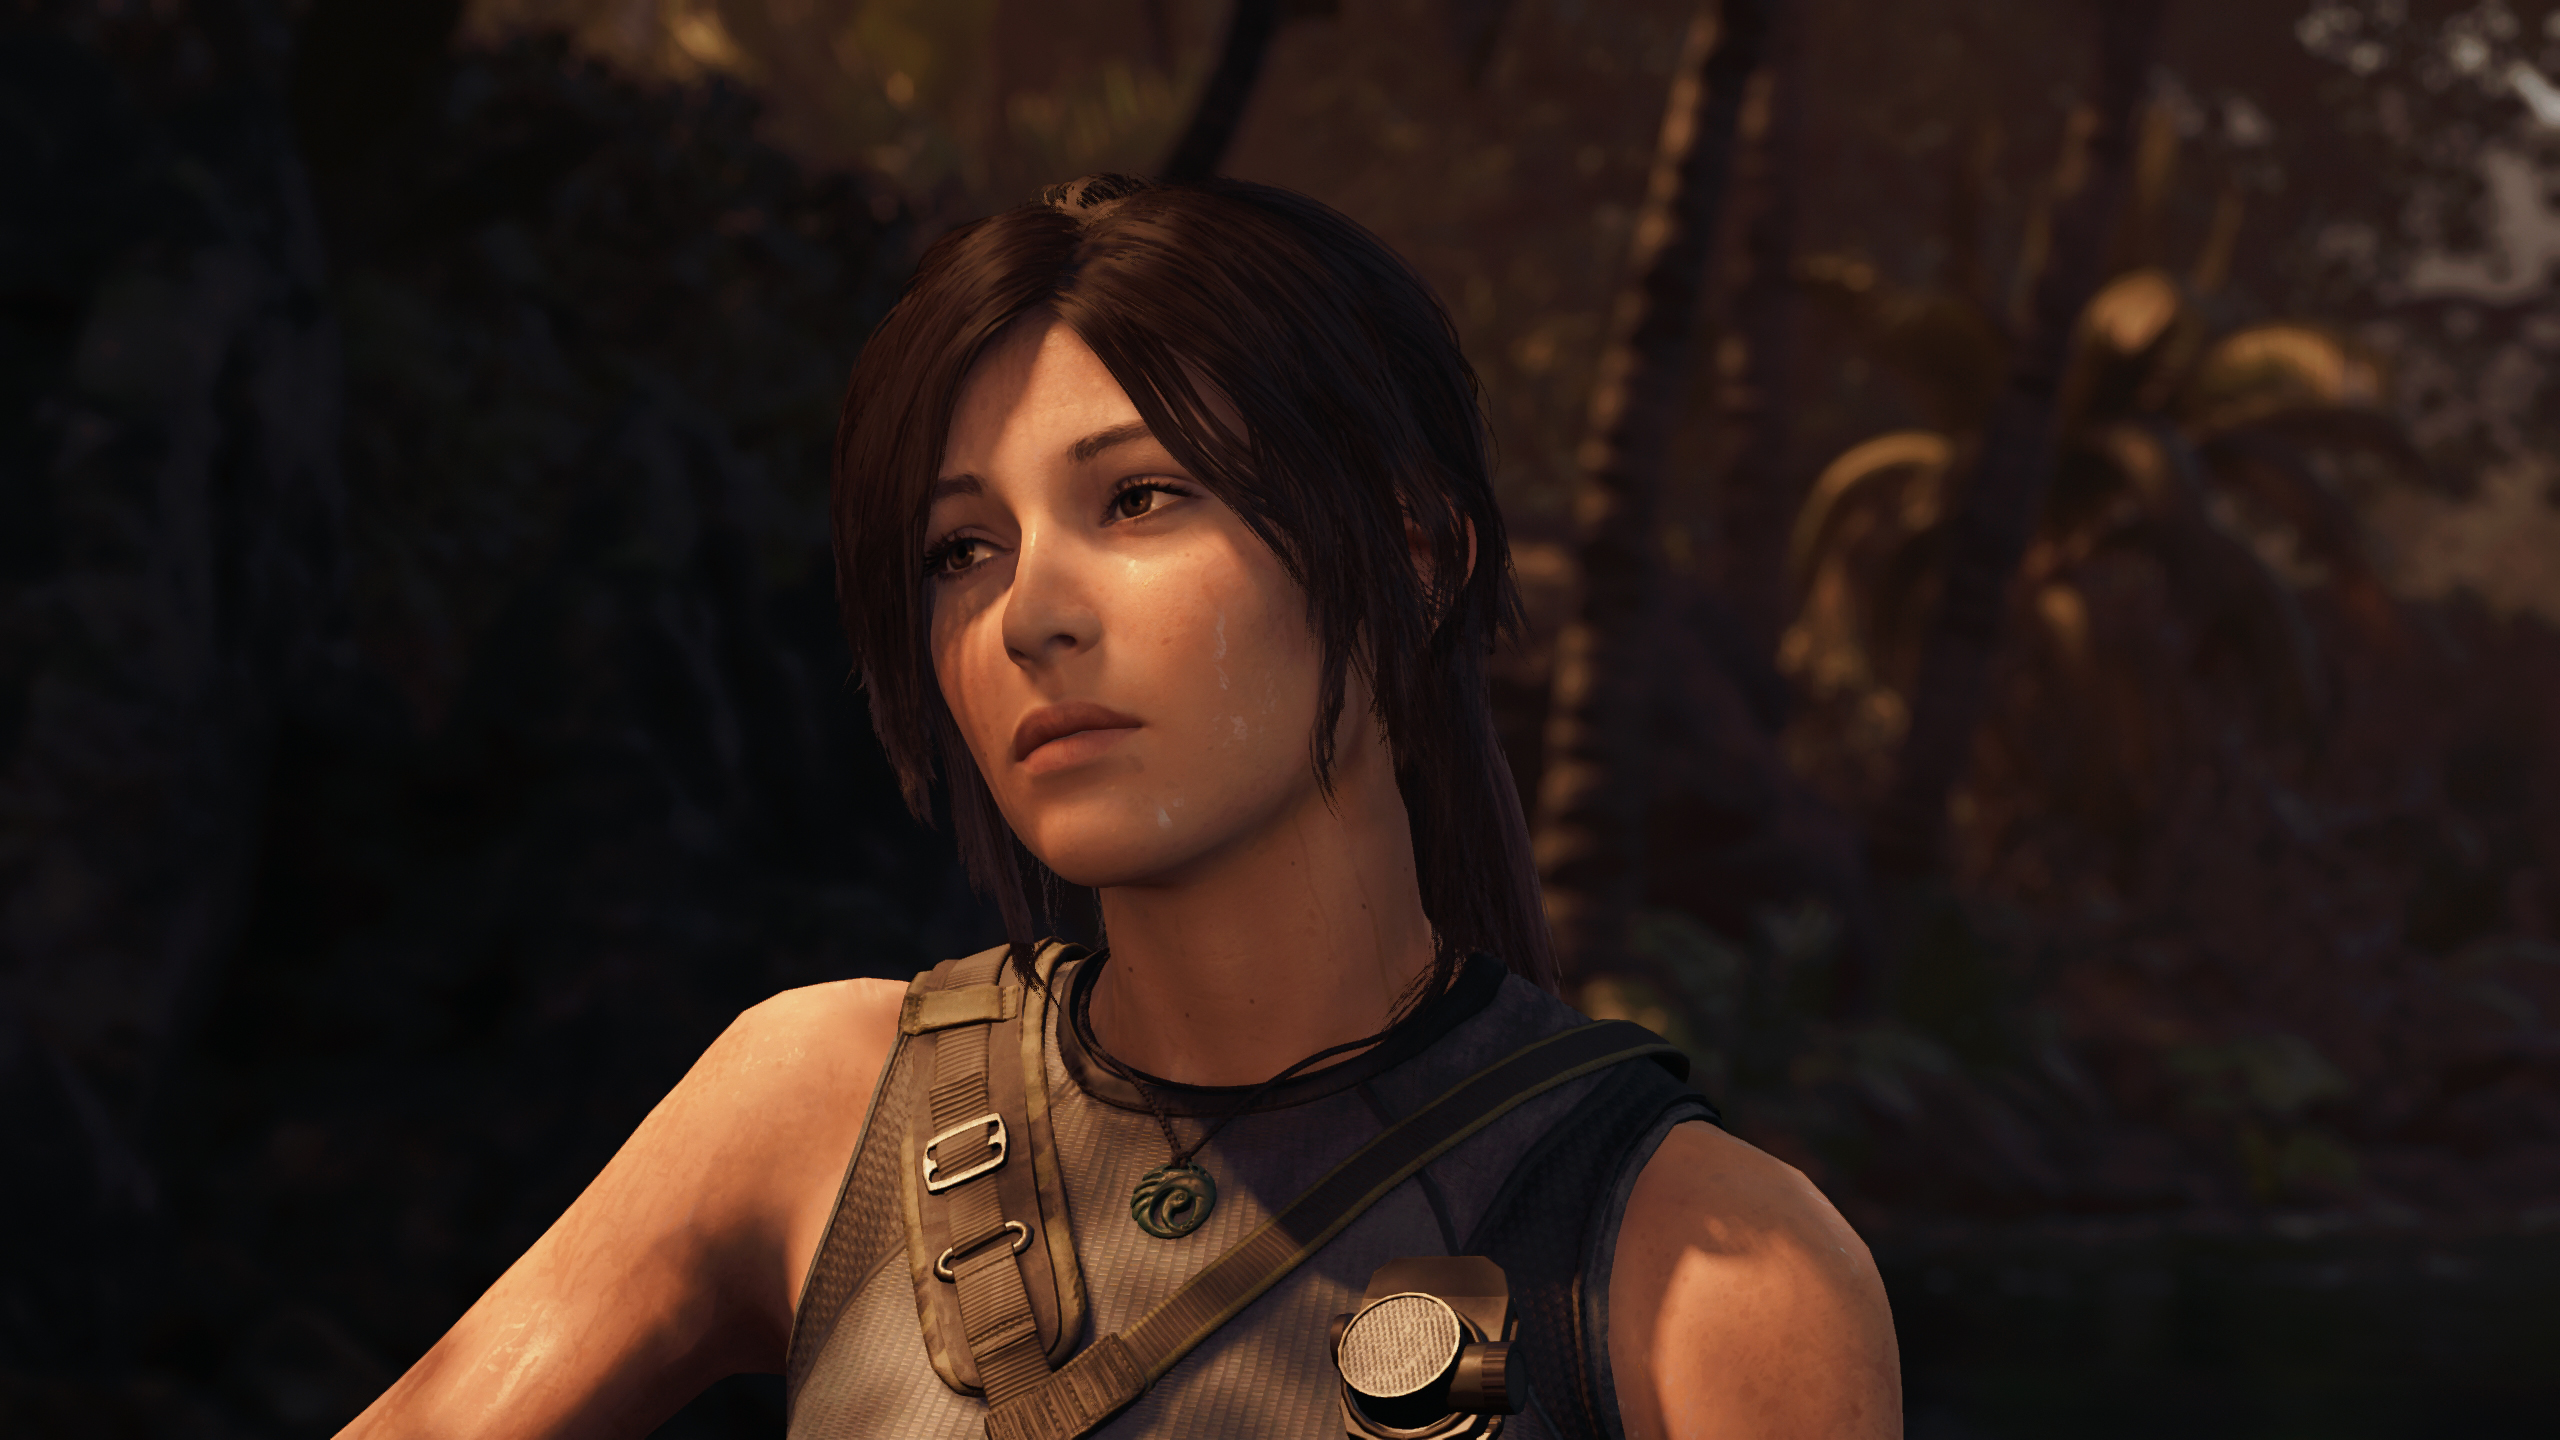 SOTTR_2019_03_24_14_48_24_120.jpg - Shadow of the Tomb Raider